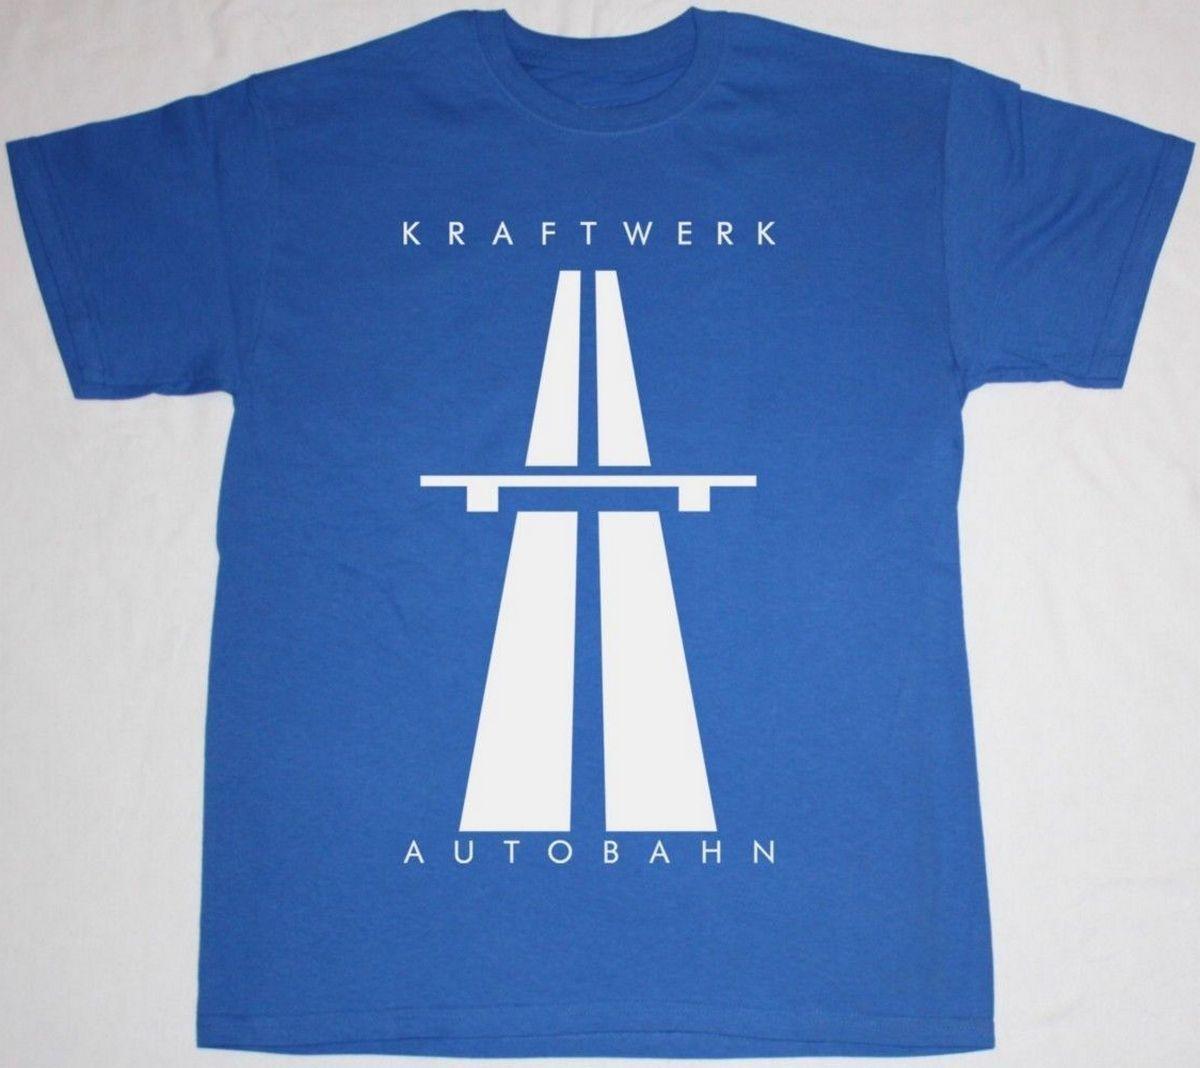 KRAFTWERK AUTOBAHN KRAUTROCK ELECTRONIC SYNTHROCK NEW ROYAL BLUE T-SHIRT Men Summer Short Sleeves T Shirt